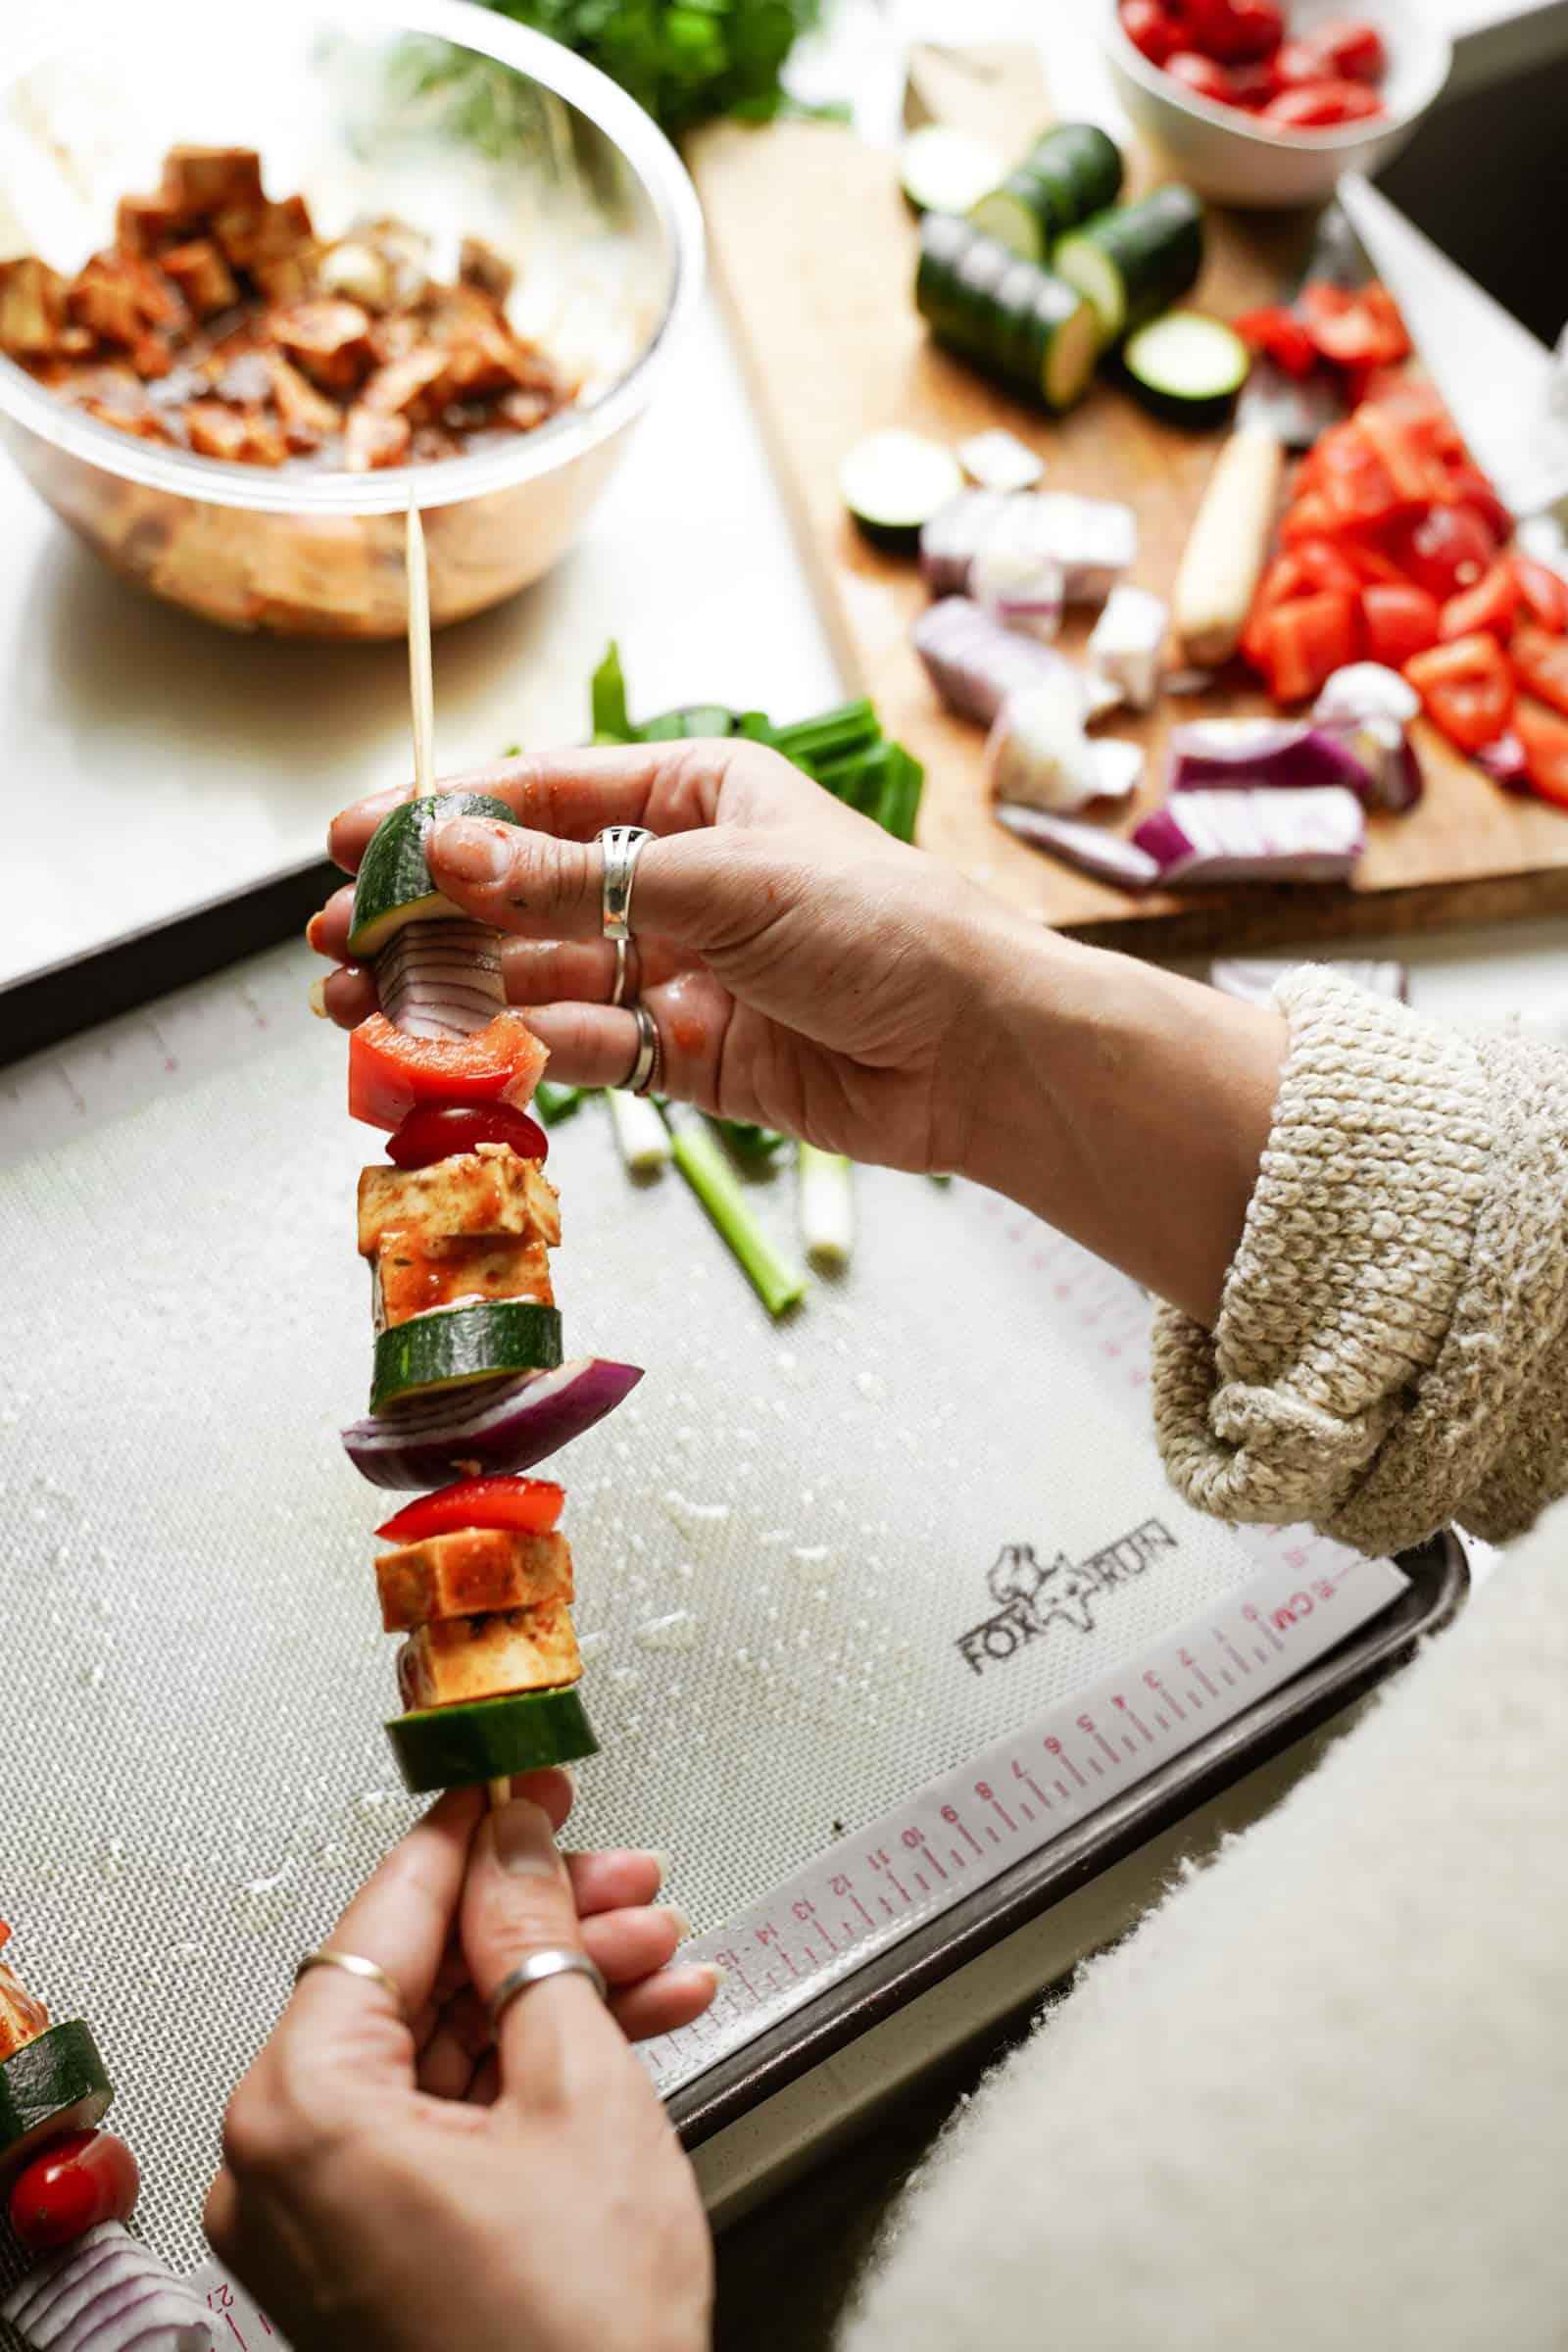 Veggies and tofu being put on skewers for Marinated Tofu and Vegetable Skewers